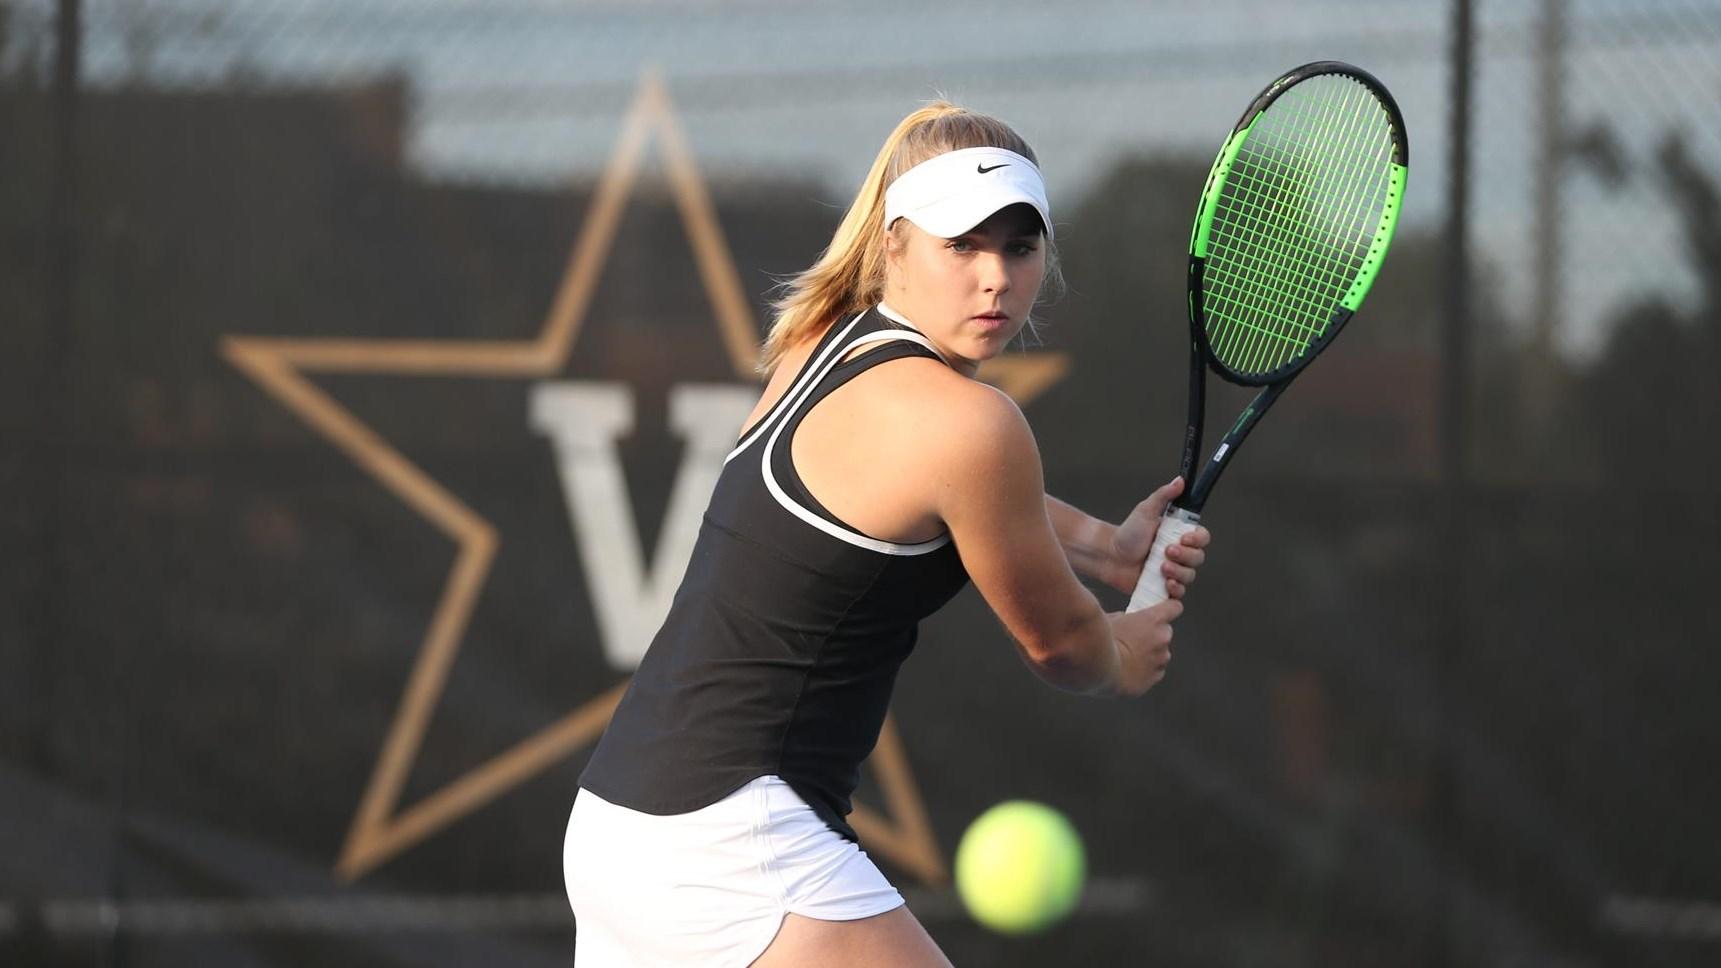 W. tennis Lauren Gish Action Shot